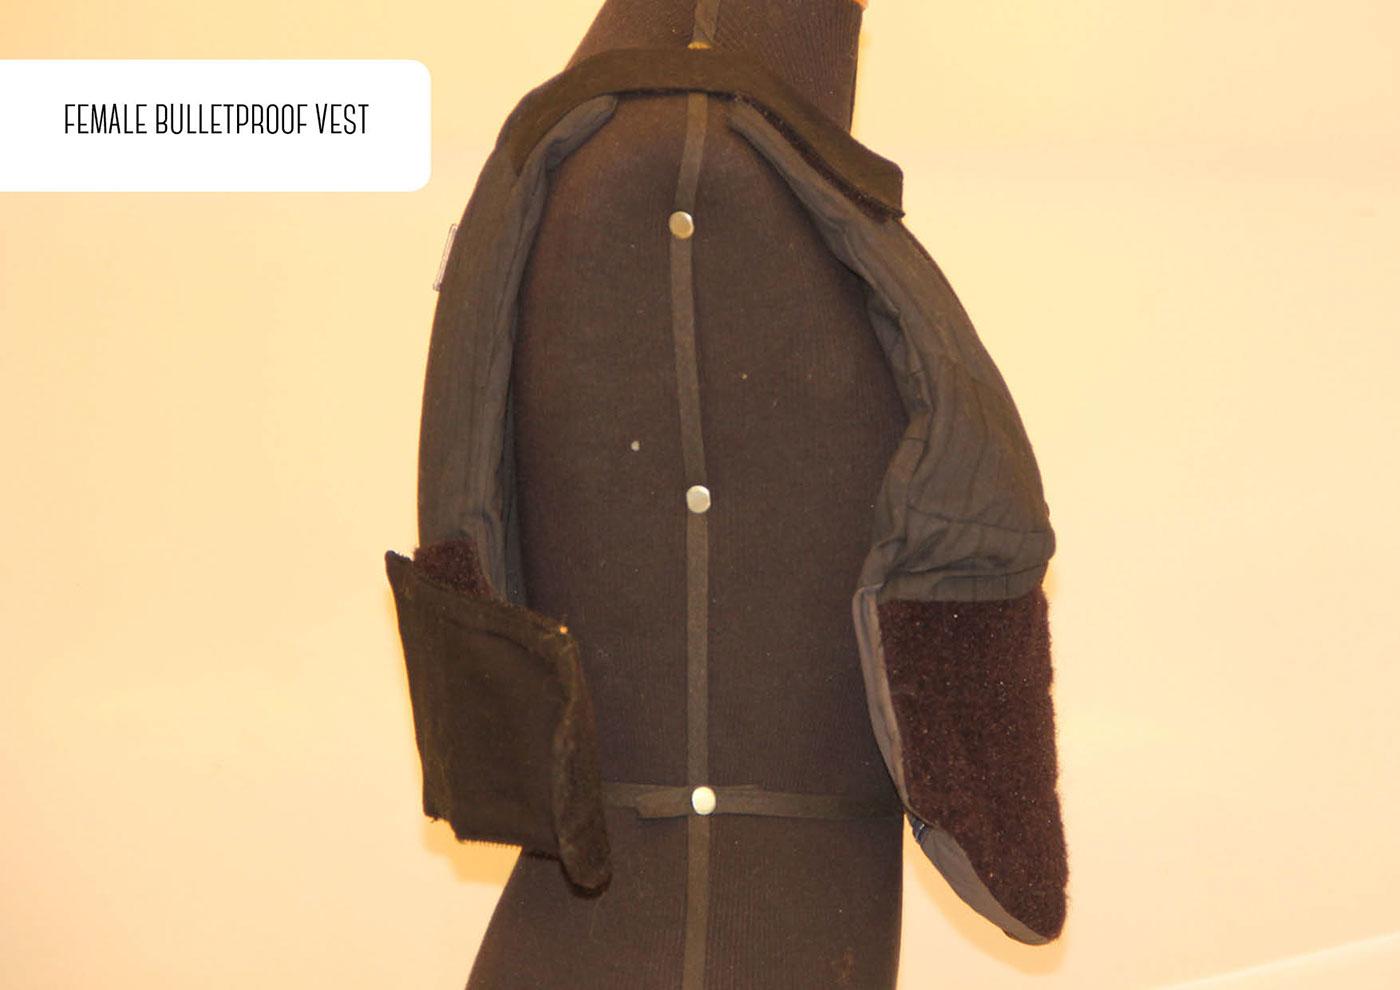 Female ballistic vest